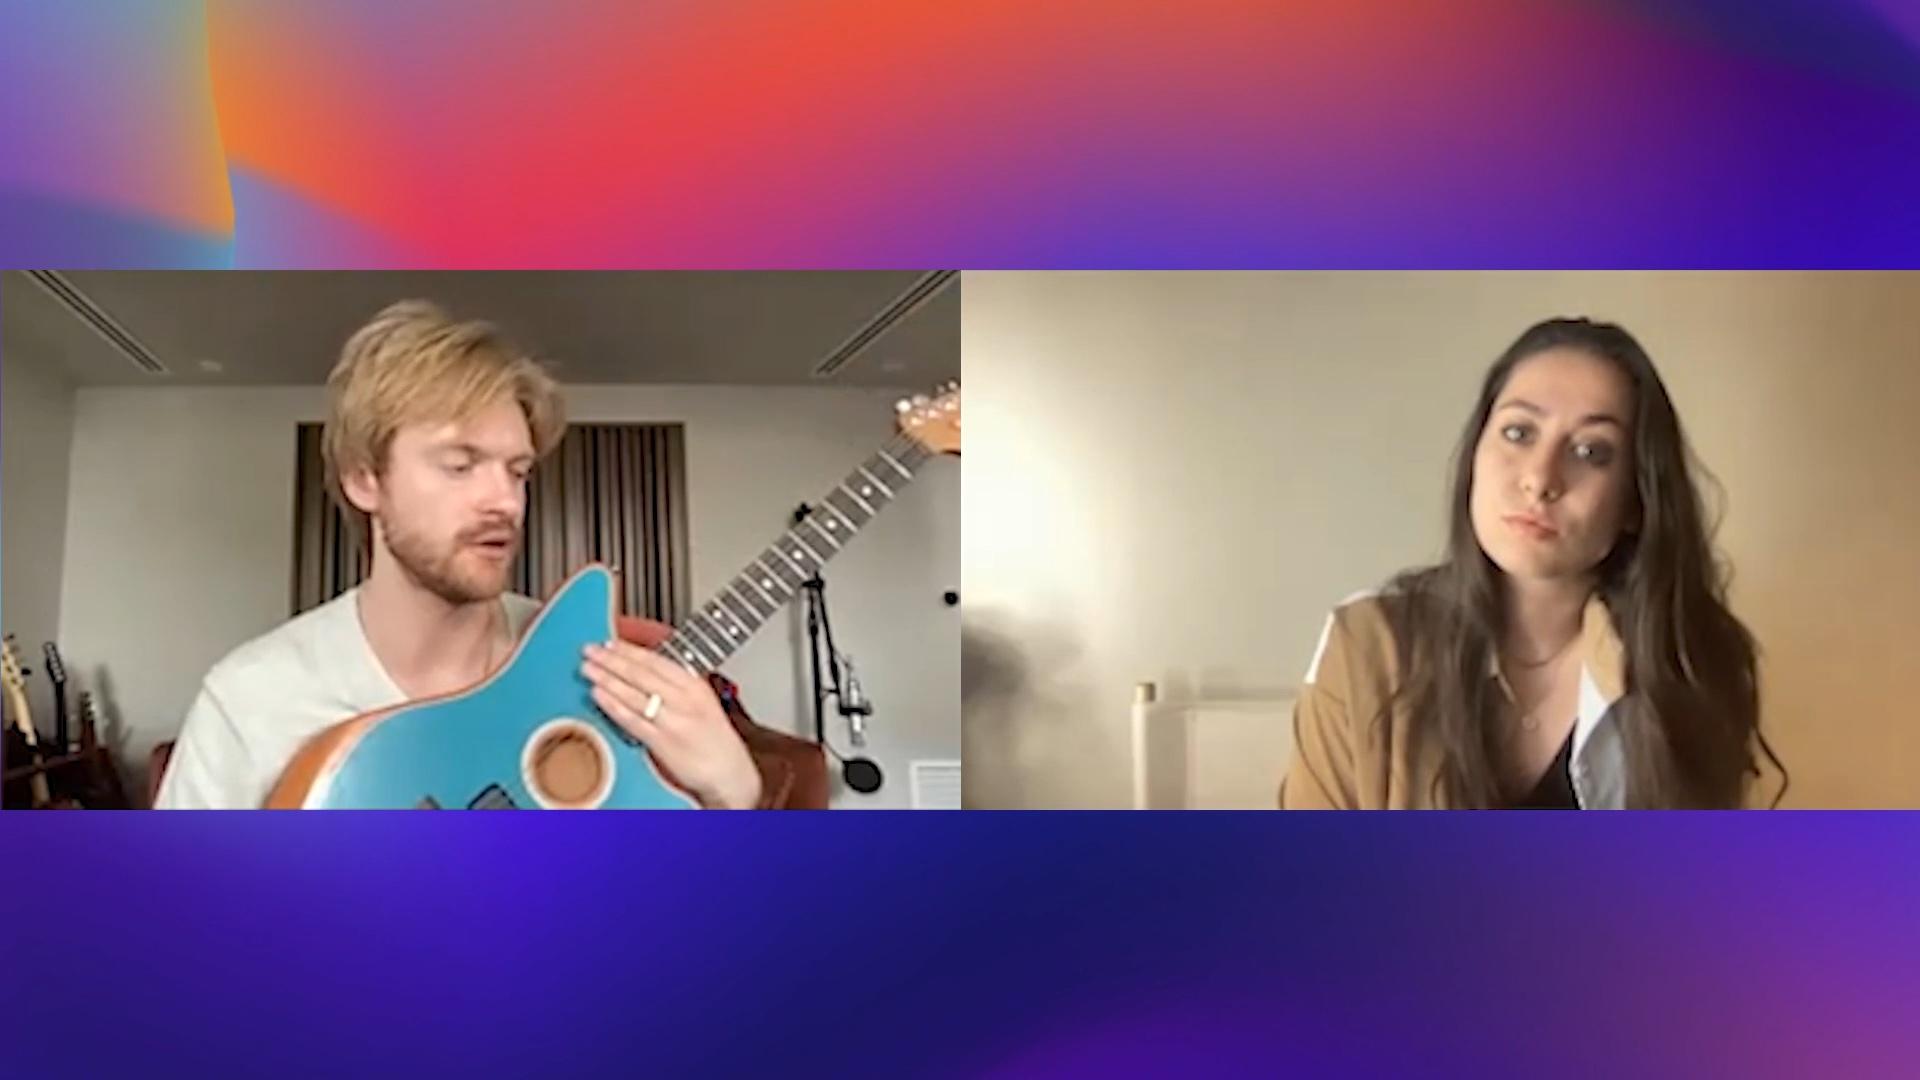 FINNEAS on His Fender Guitar Hotline and Billie Eilish's New Album